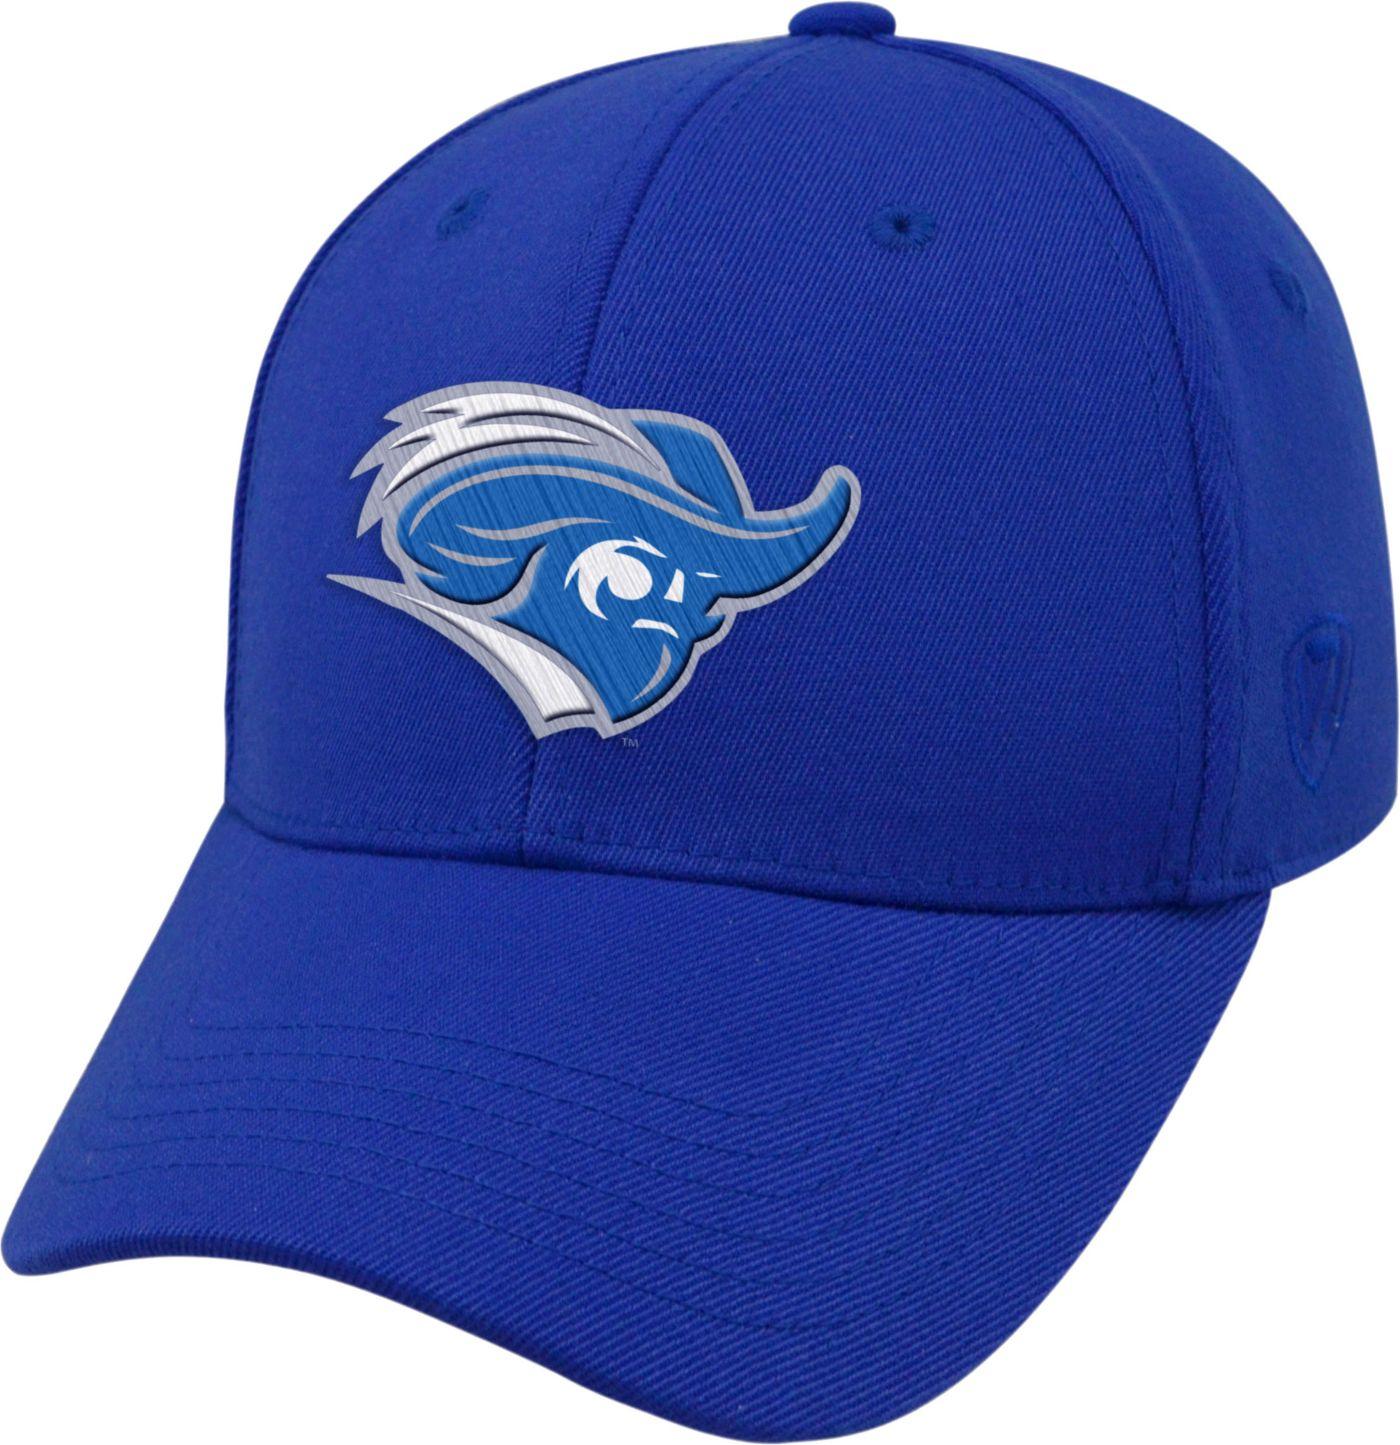 Top of the World Men's Christopher Newport Captains Royal Blue Premium Collection M-Fit Hat